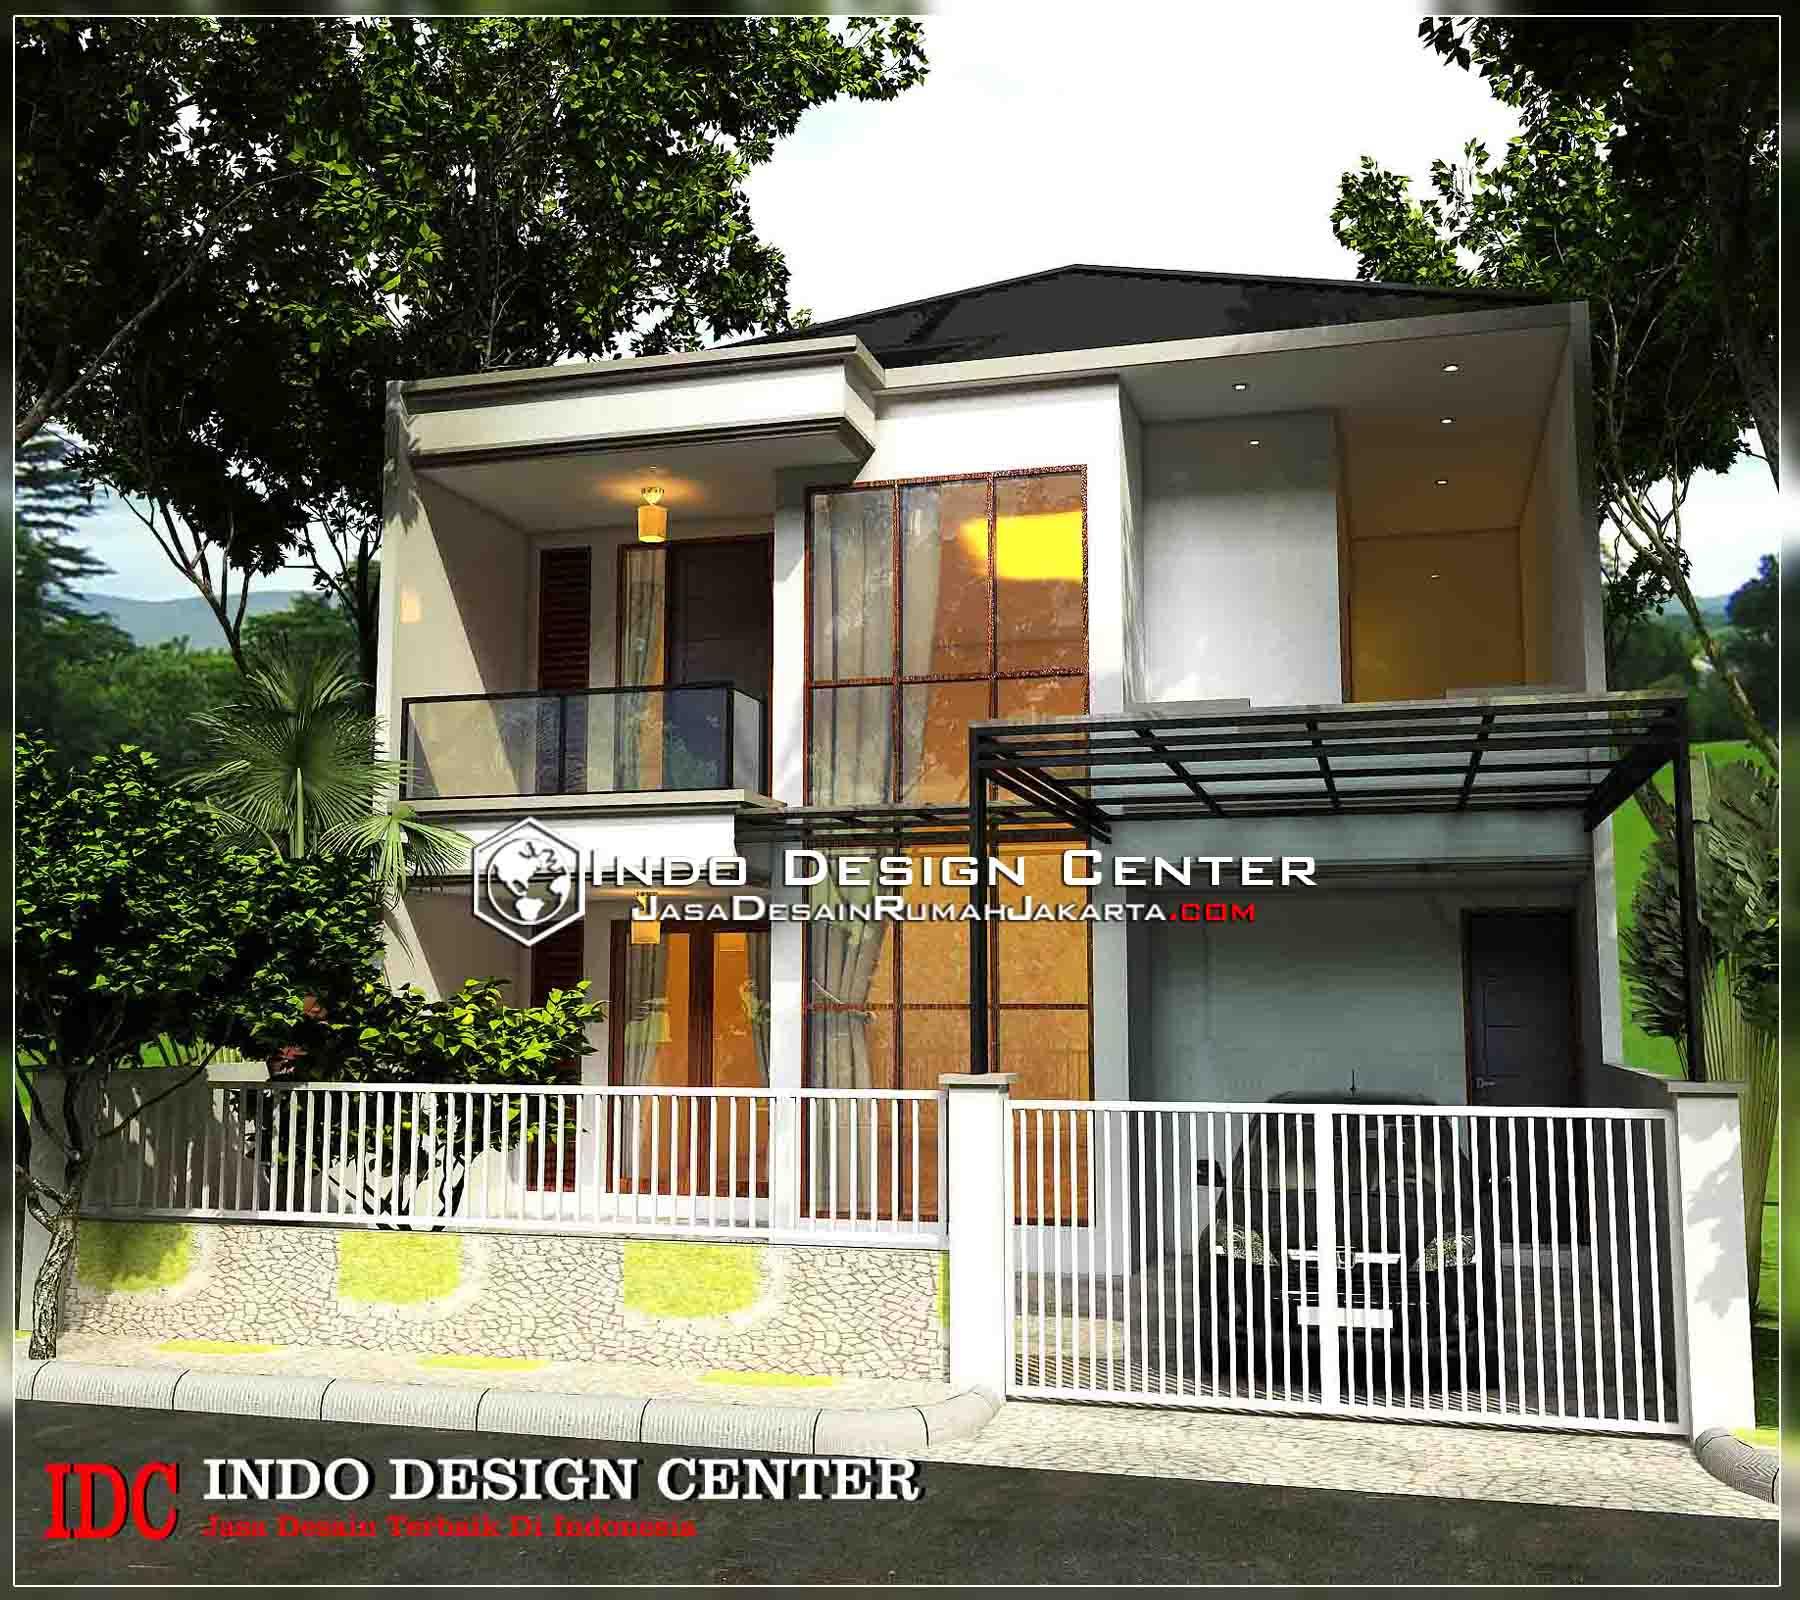 68 desain rumah minimalis modern 2 lantai desain rumah for Design rumah mimimalis modern